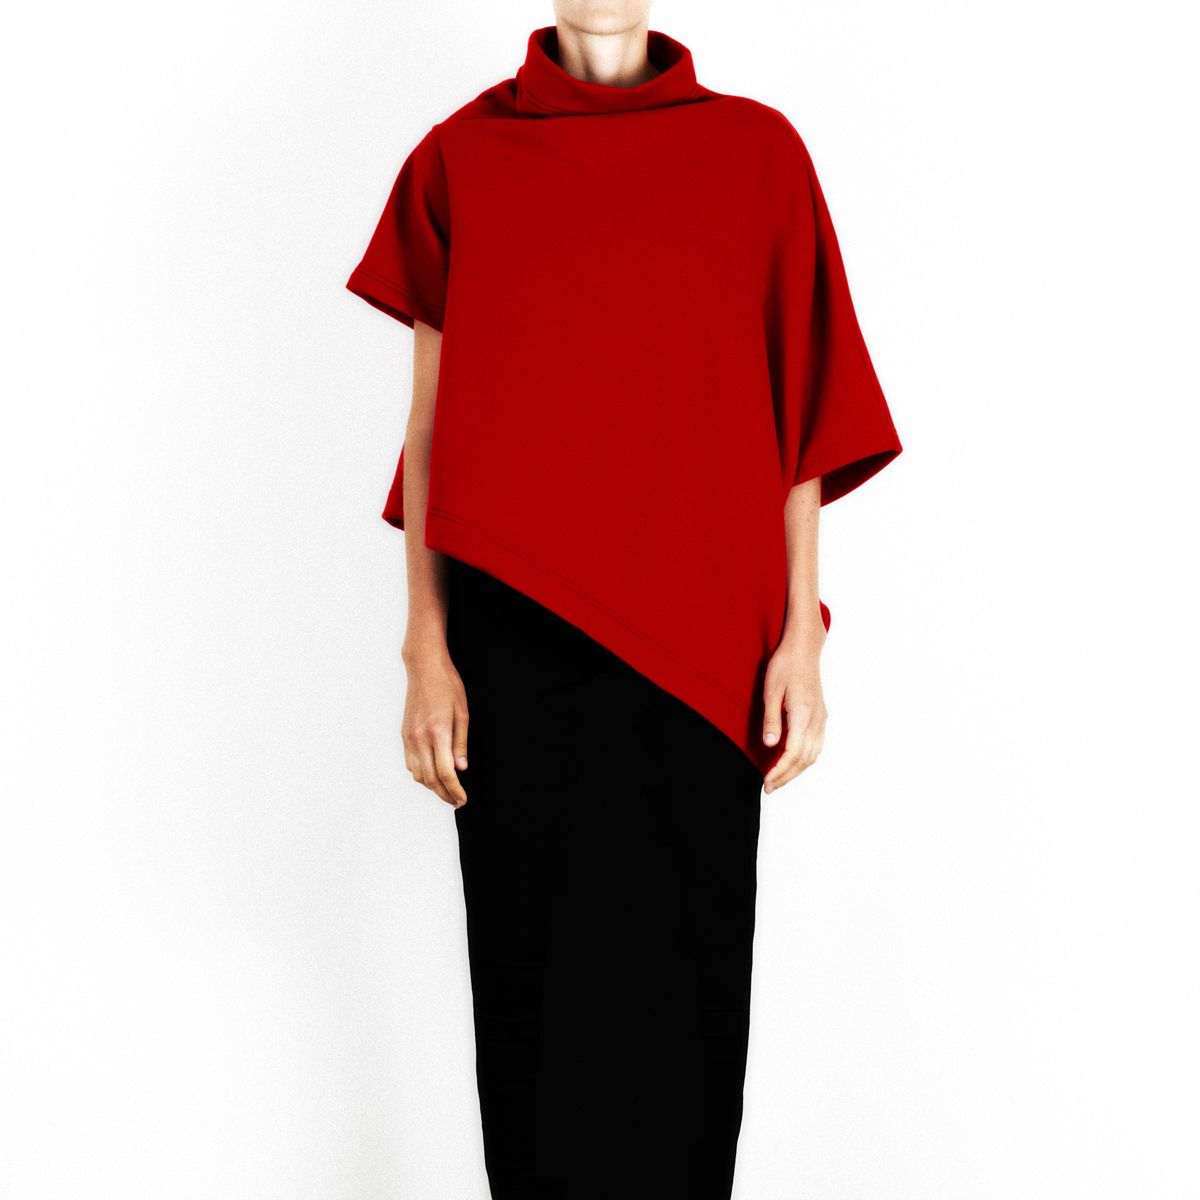 Stack sweatshirt red (With images) Sweatshirts, Cotton